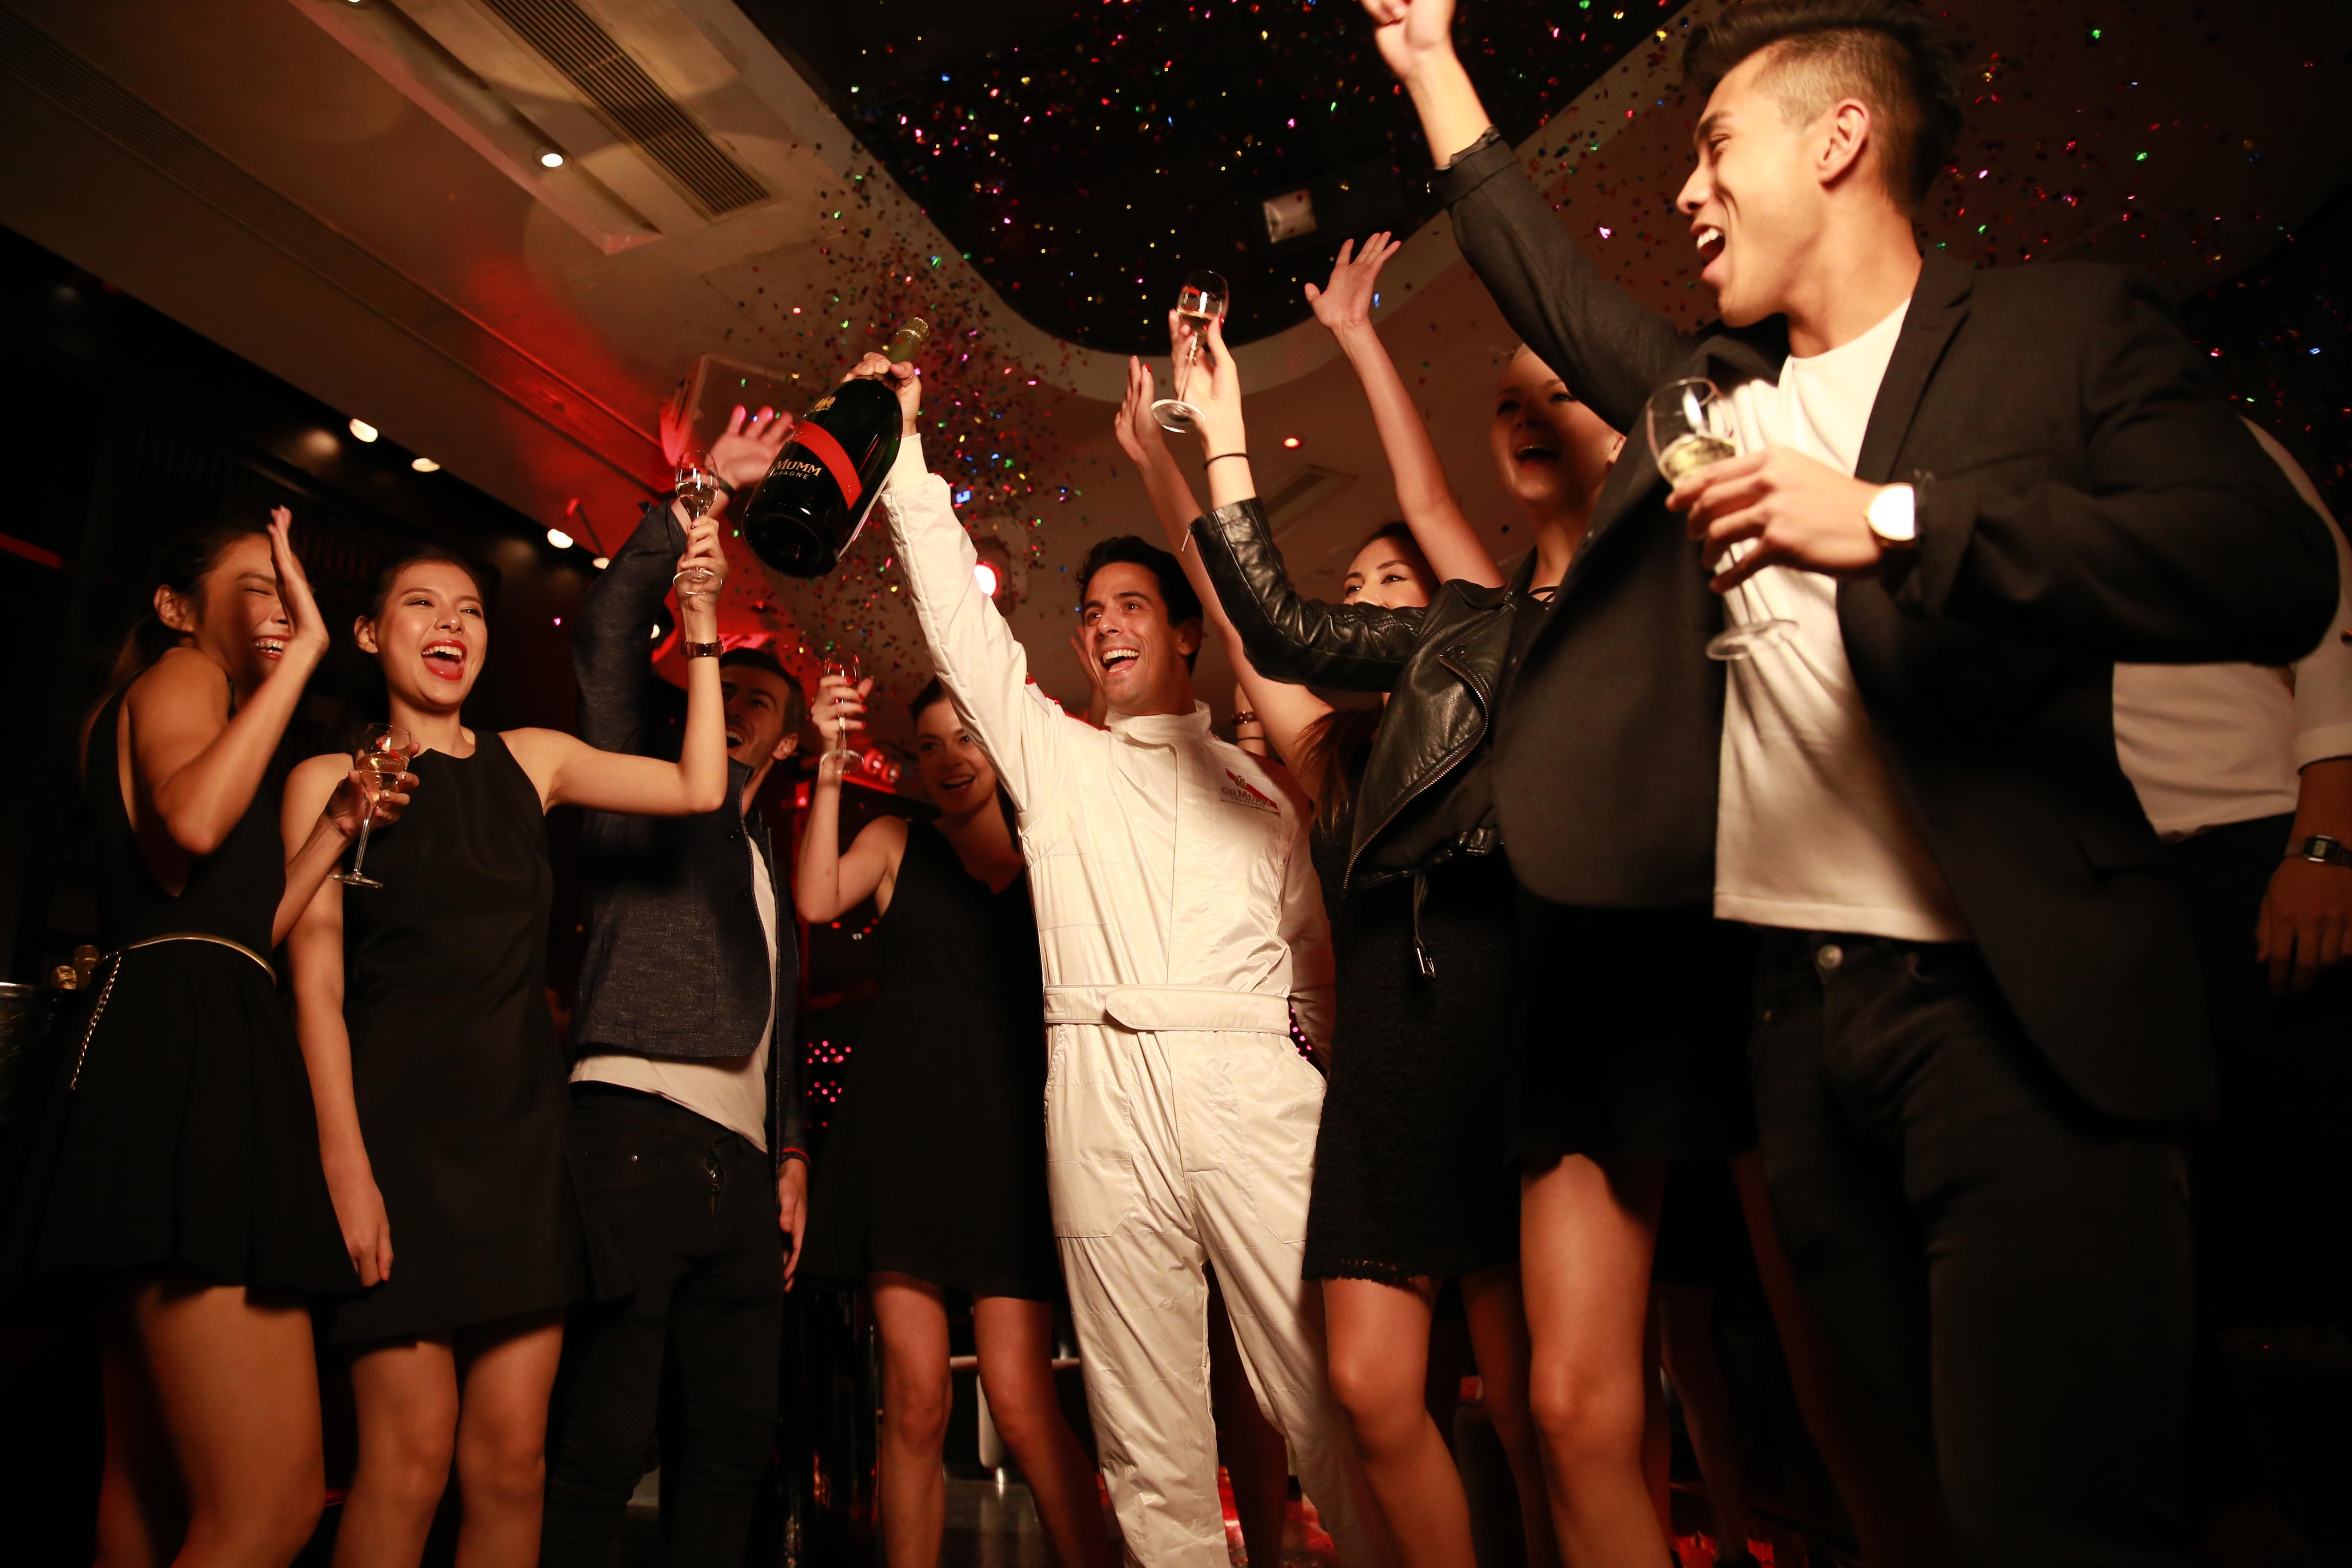 G.H.MUMM Champagne event